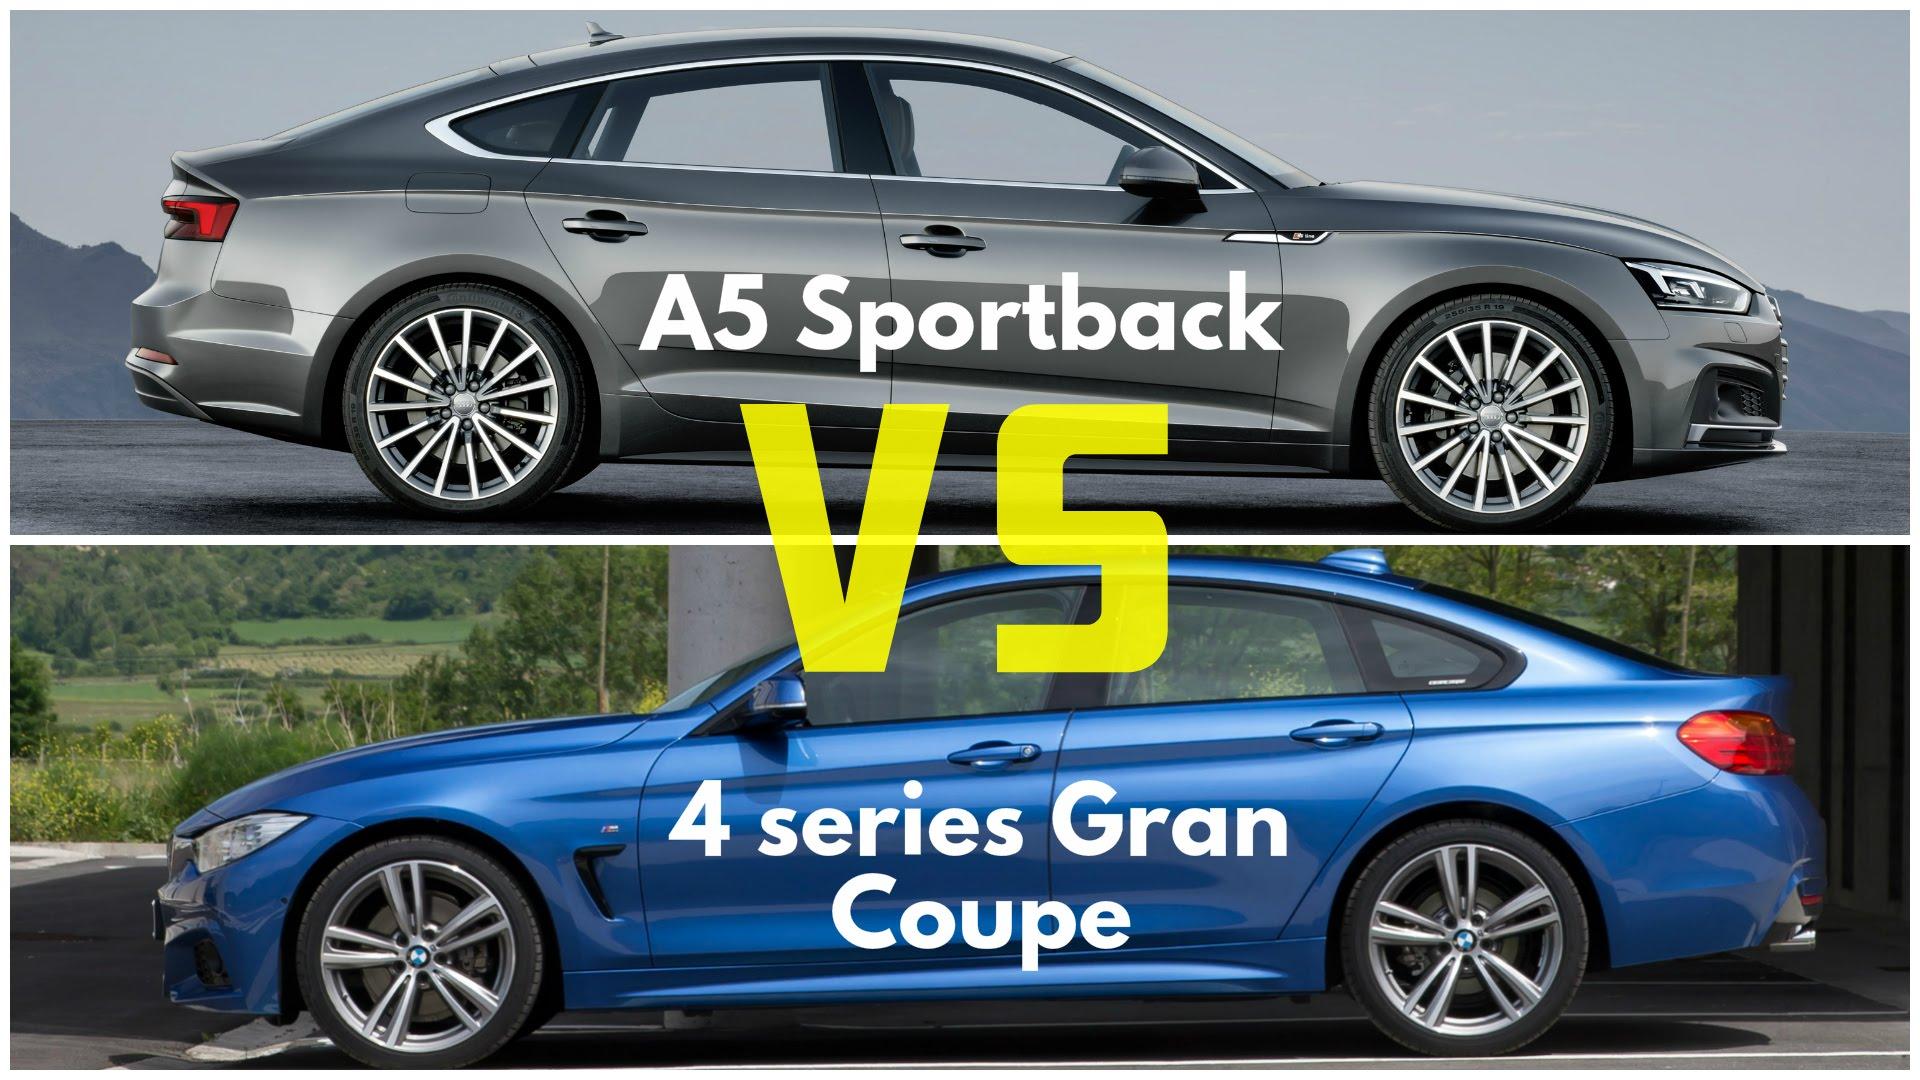 Audi A5 Sportback Vs Bmw 4 Series Gran Coupe Audi Lovers